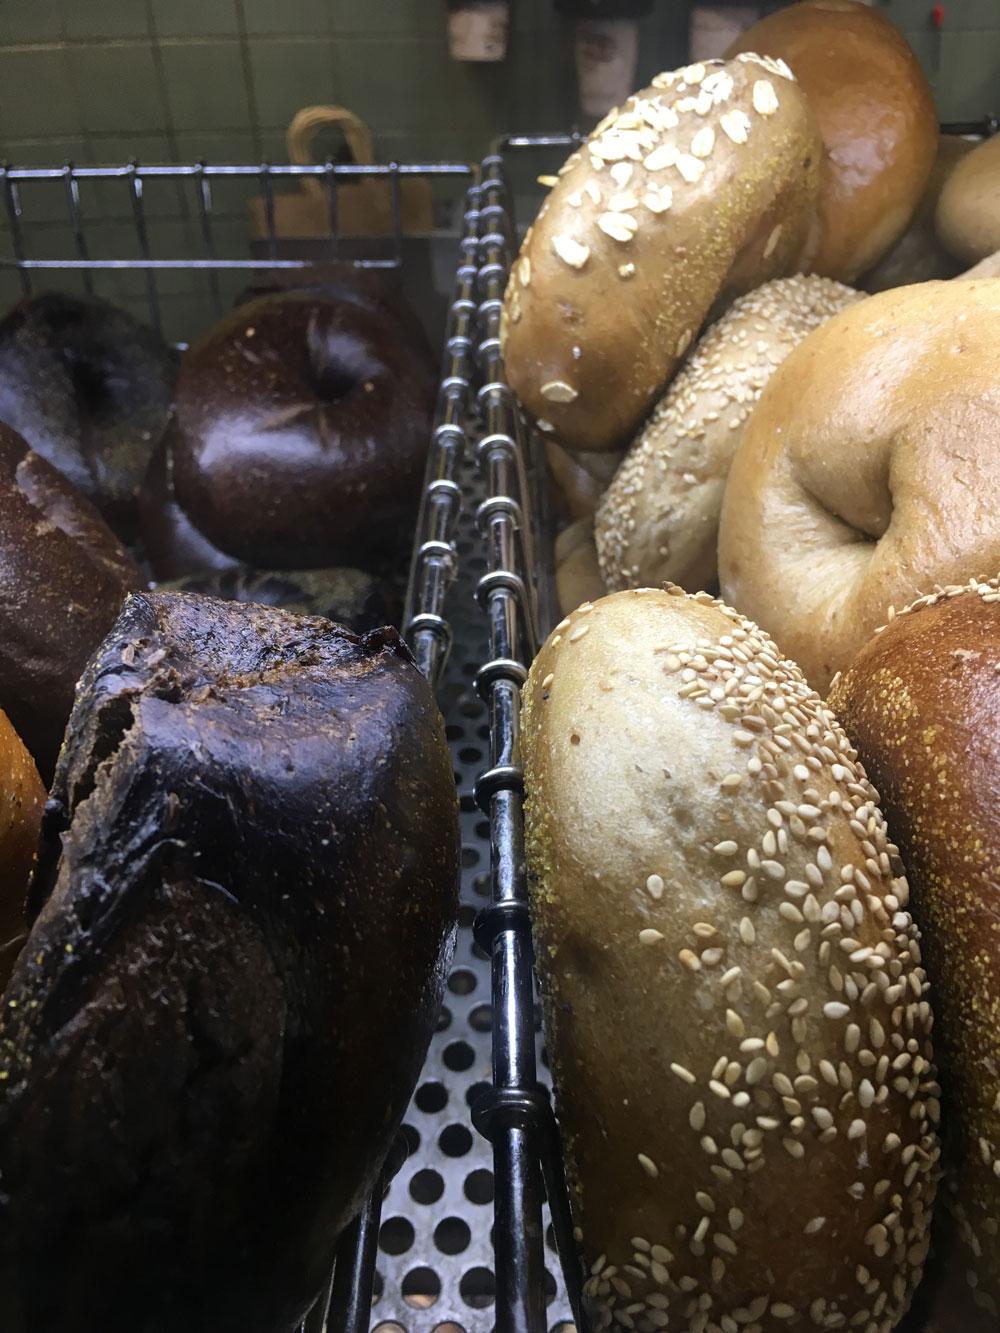 nyc-food1.jpg